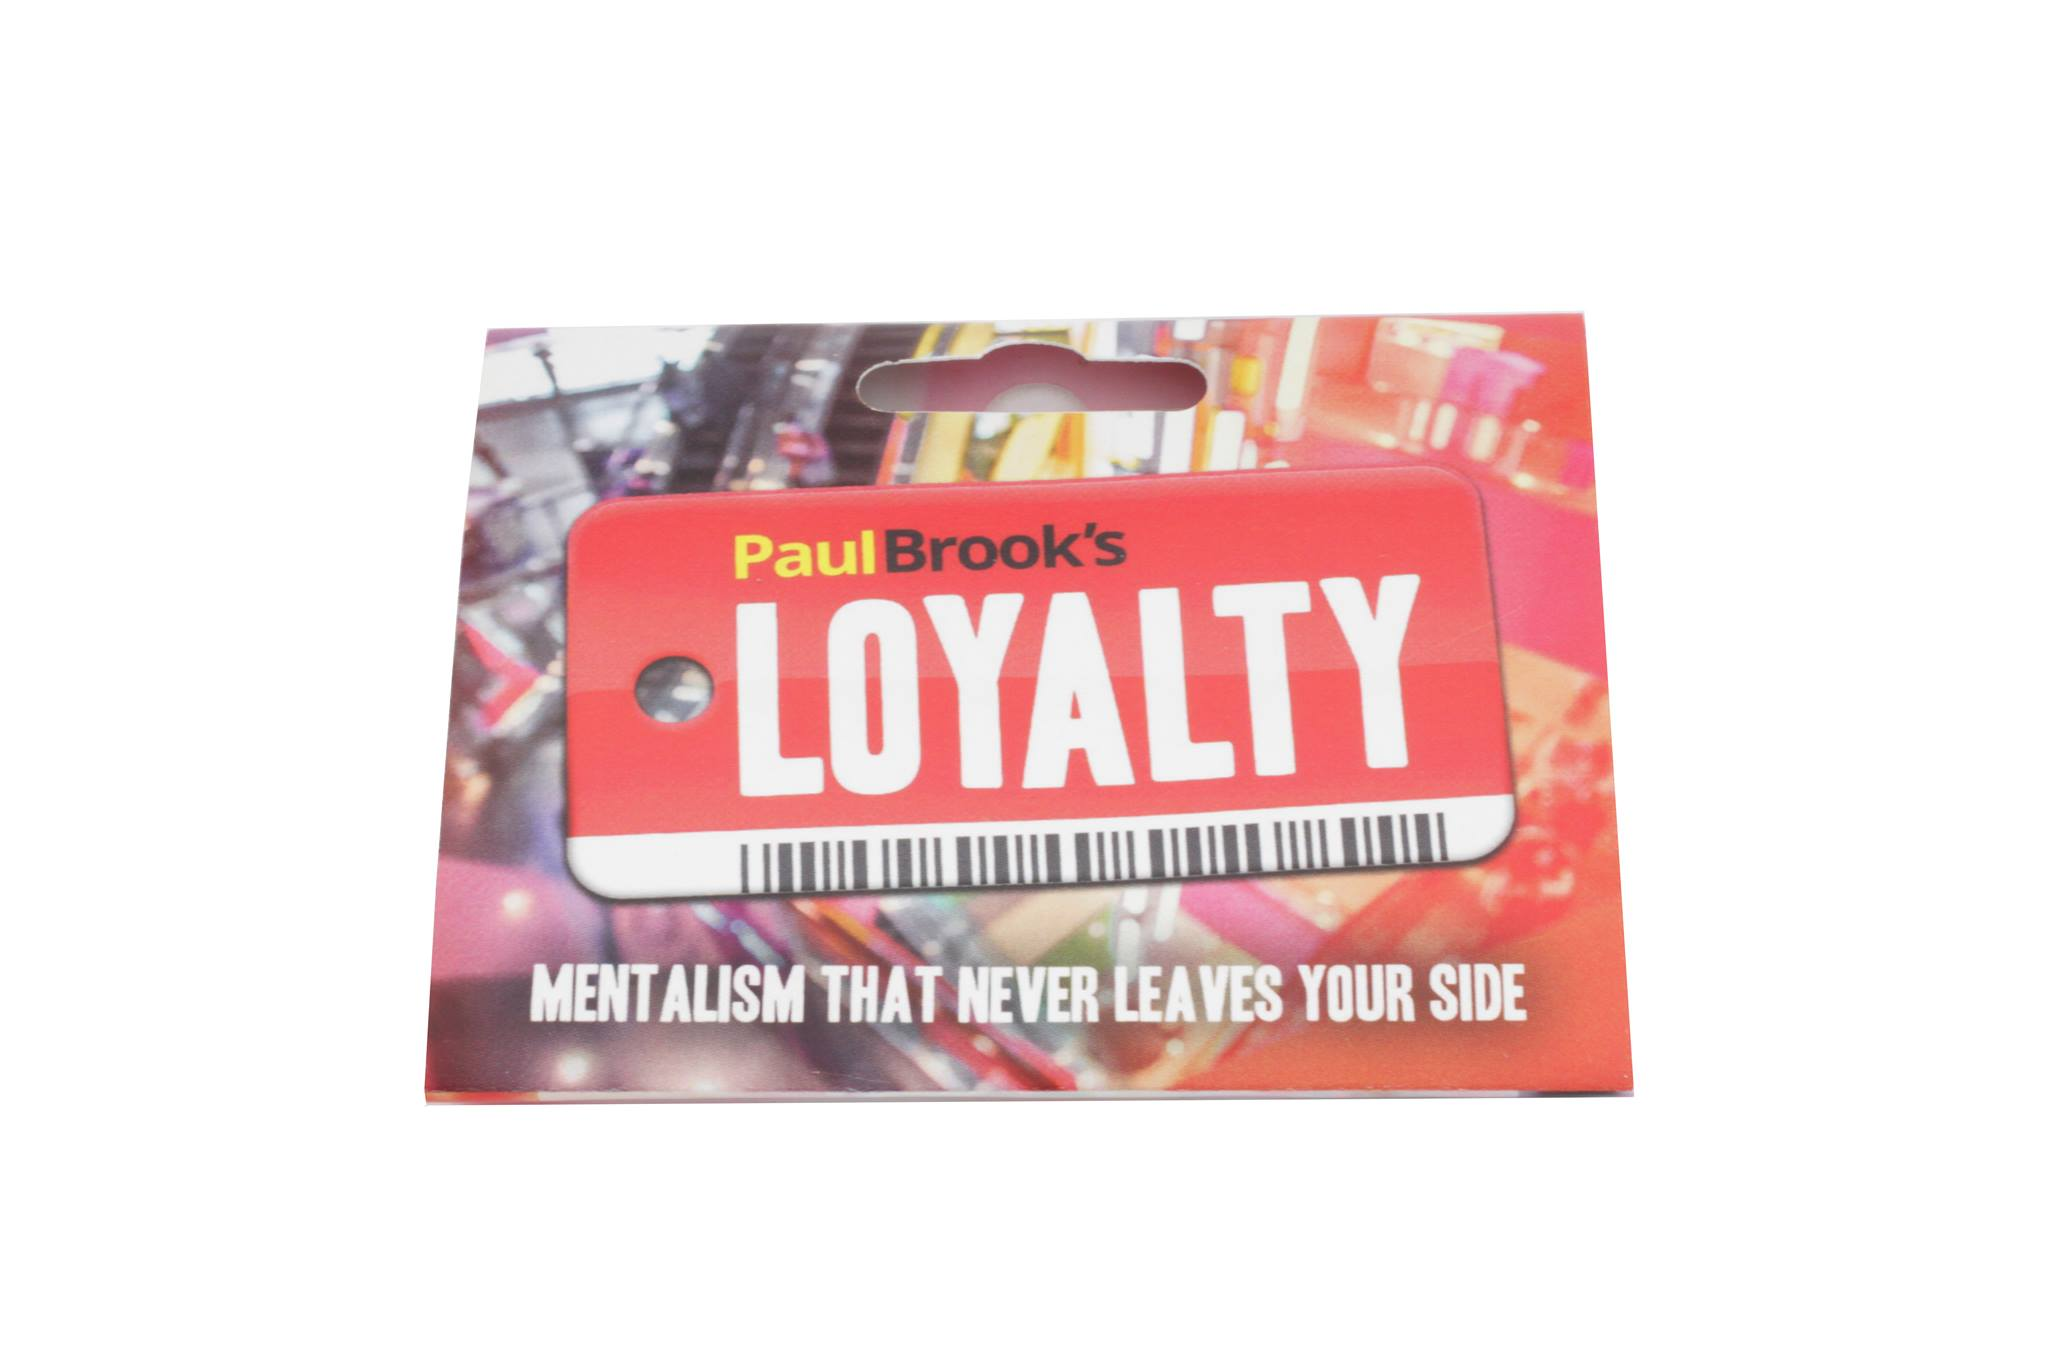 Loyalty by Paul Brook